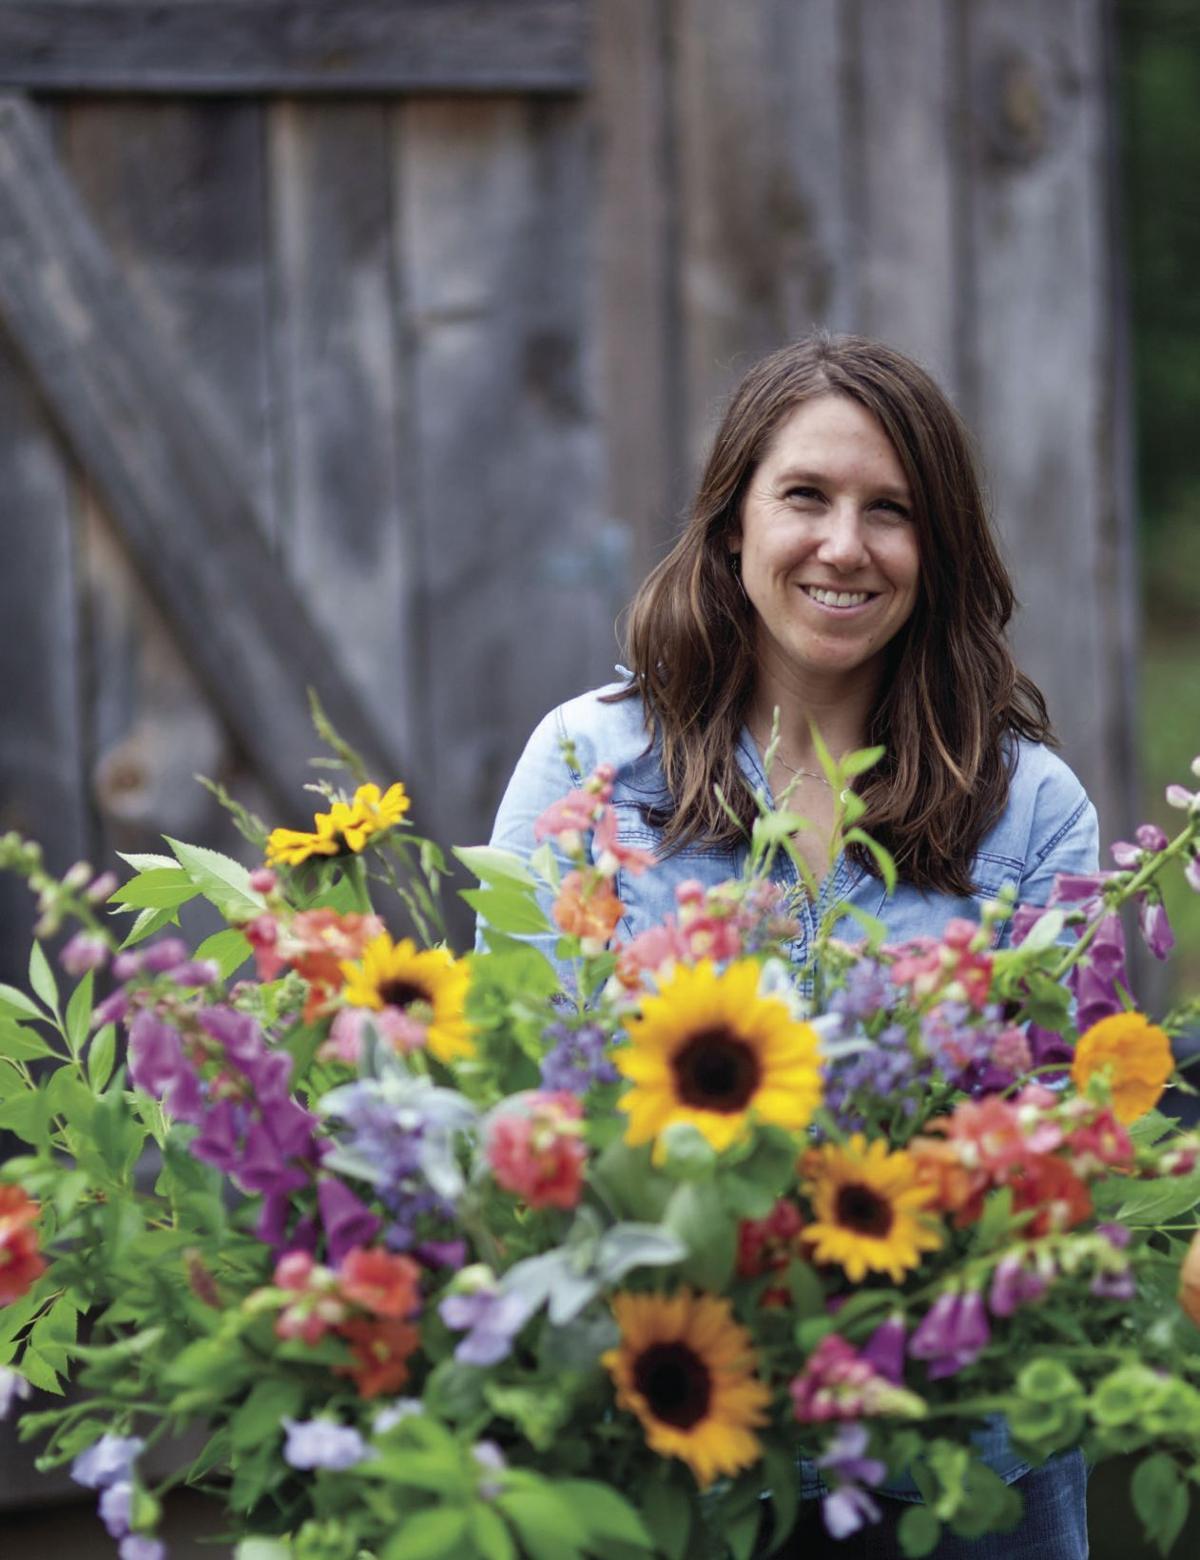 Flower Arranging 101 With Vera Flora Farm